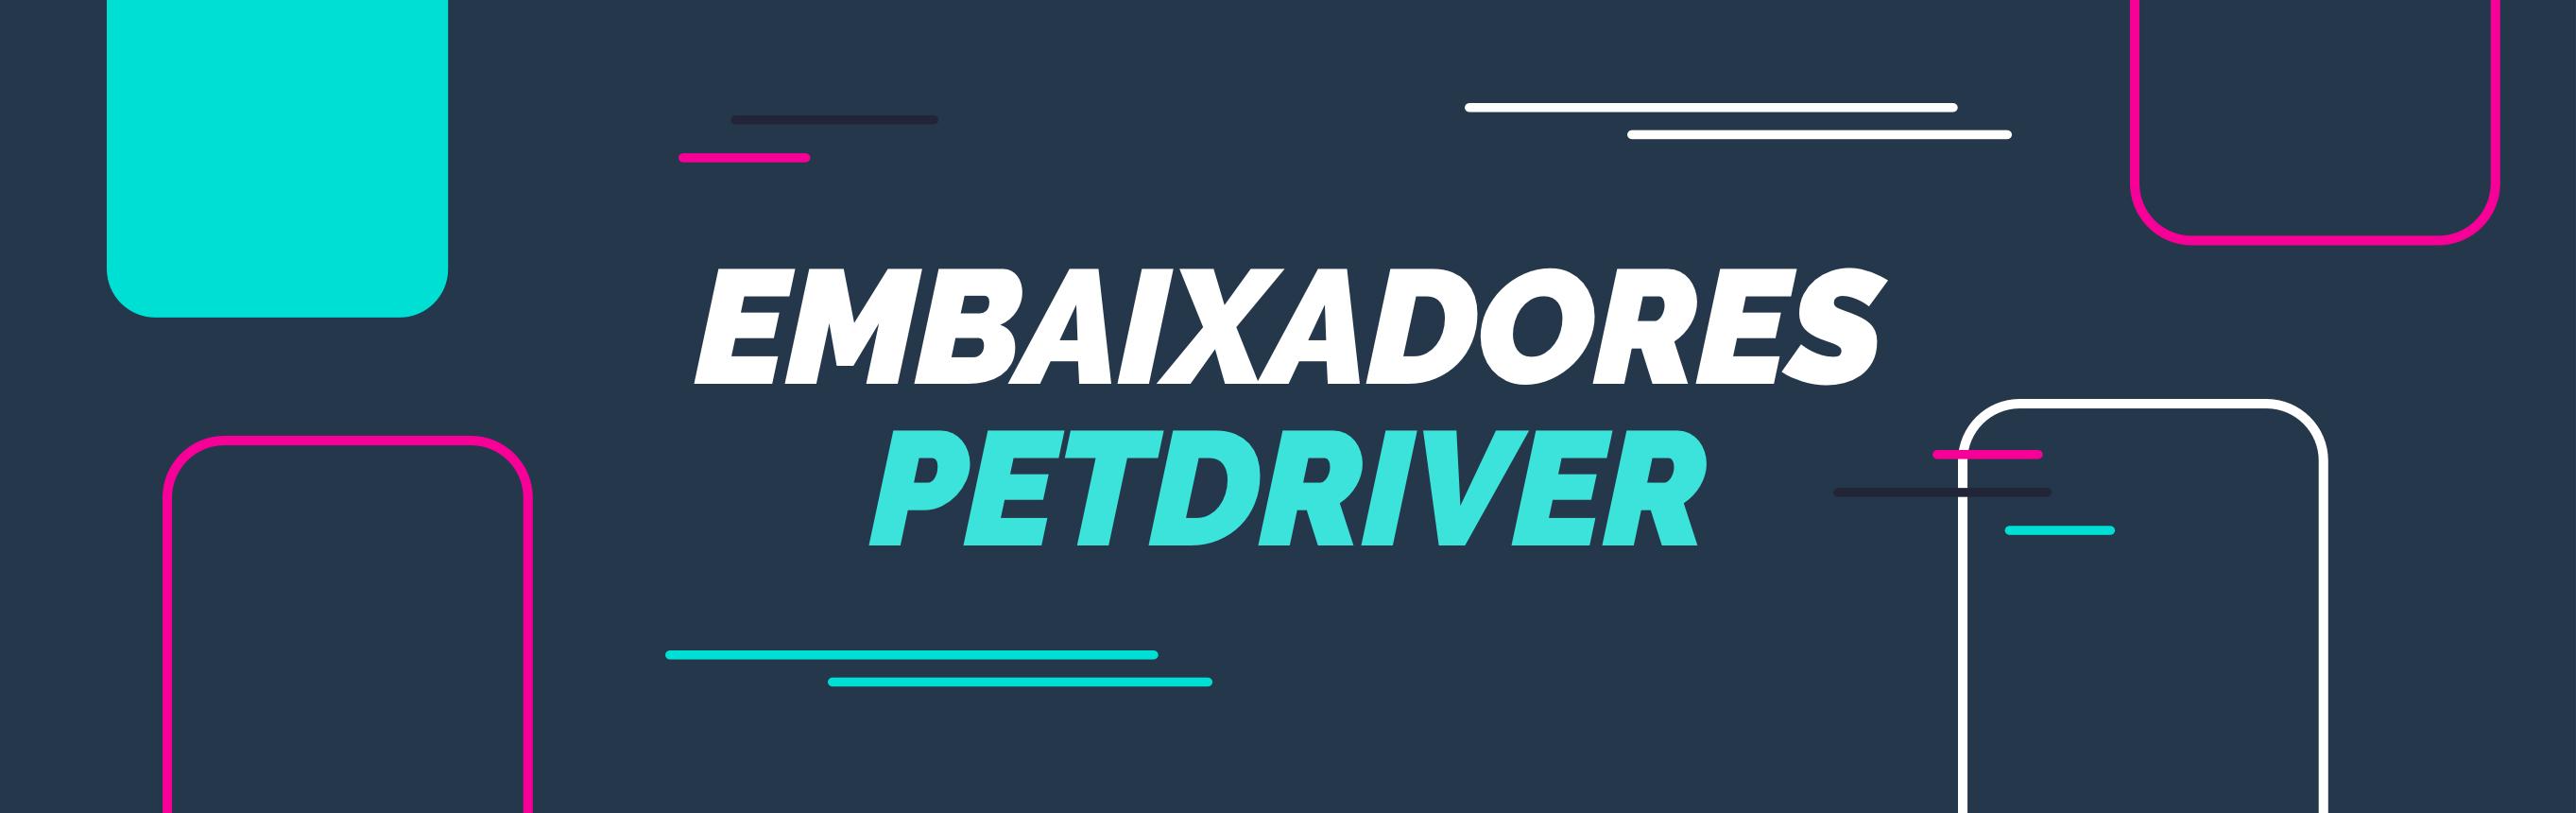 banner-embaixadores-petdriver-2